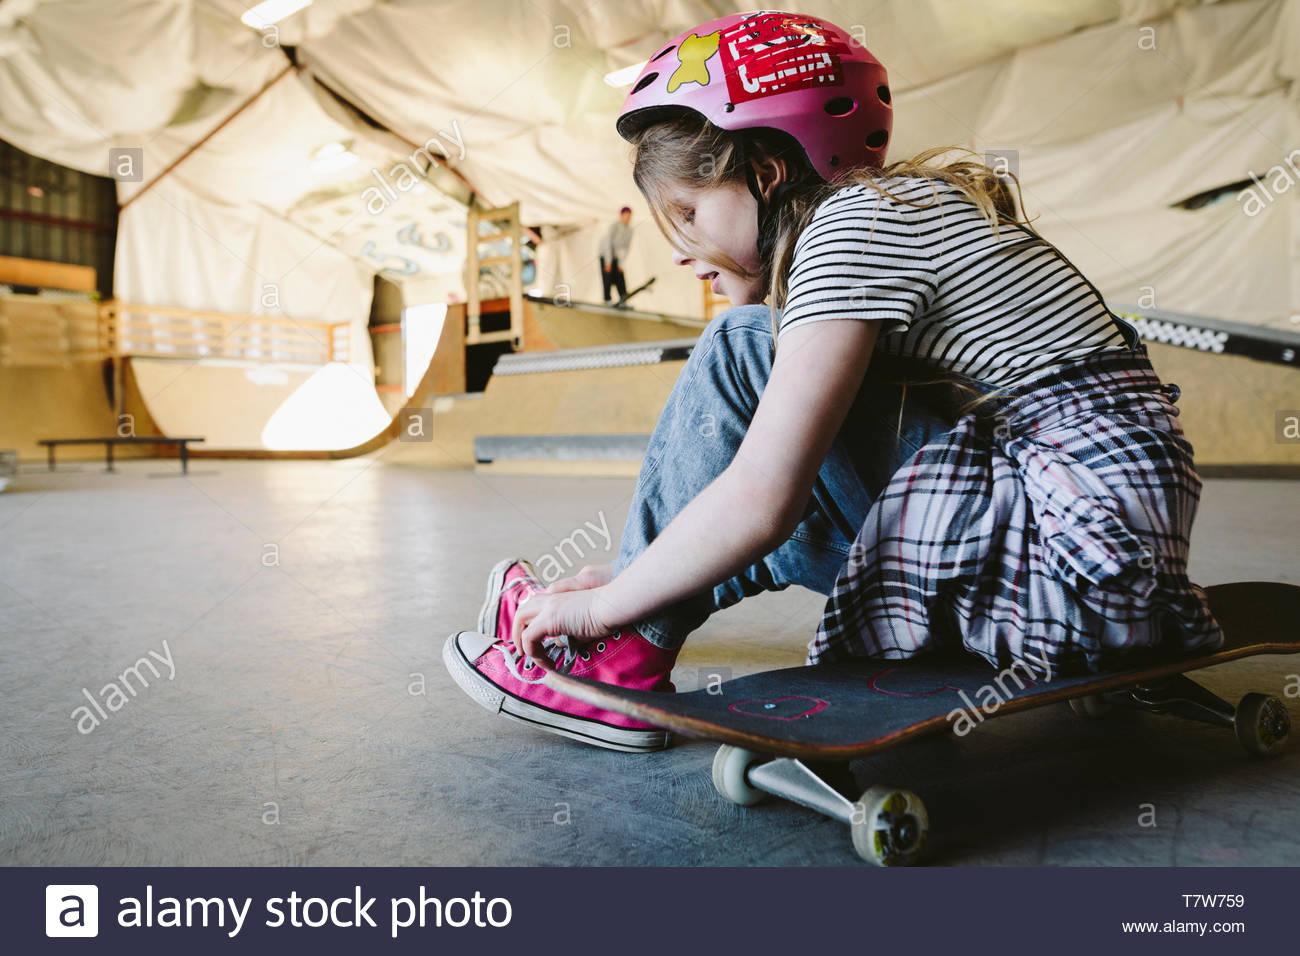 Girl tying shoelace on skateboard at indoor skate park - Stock Image